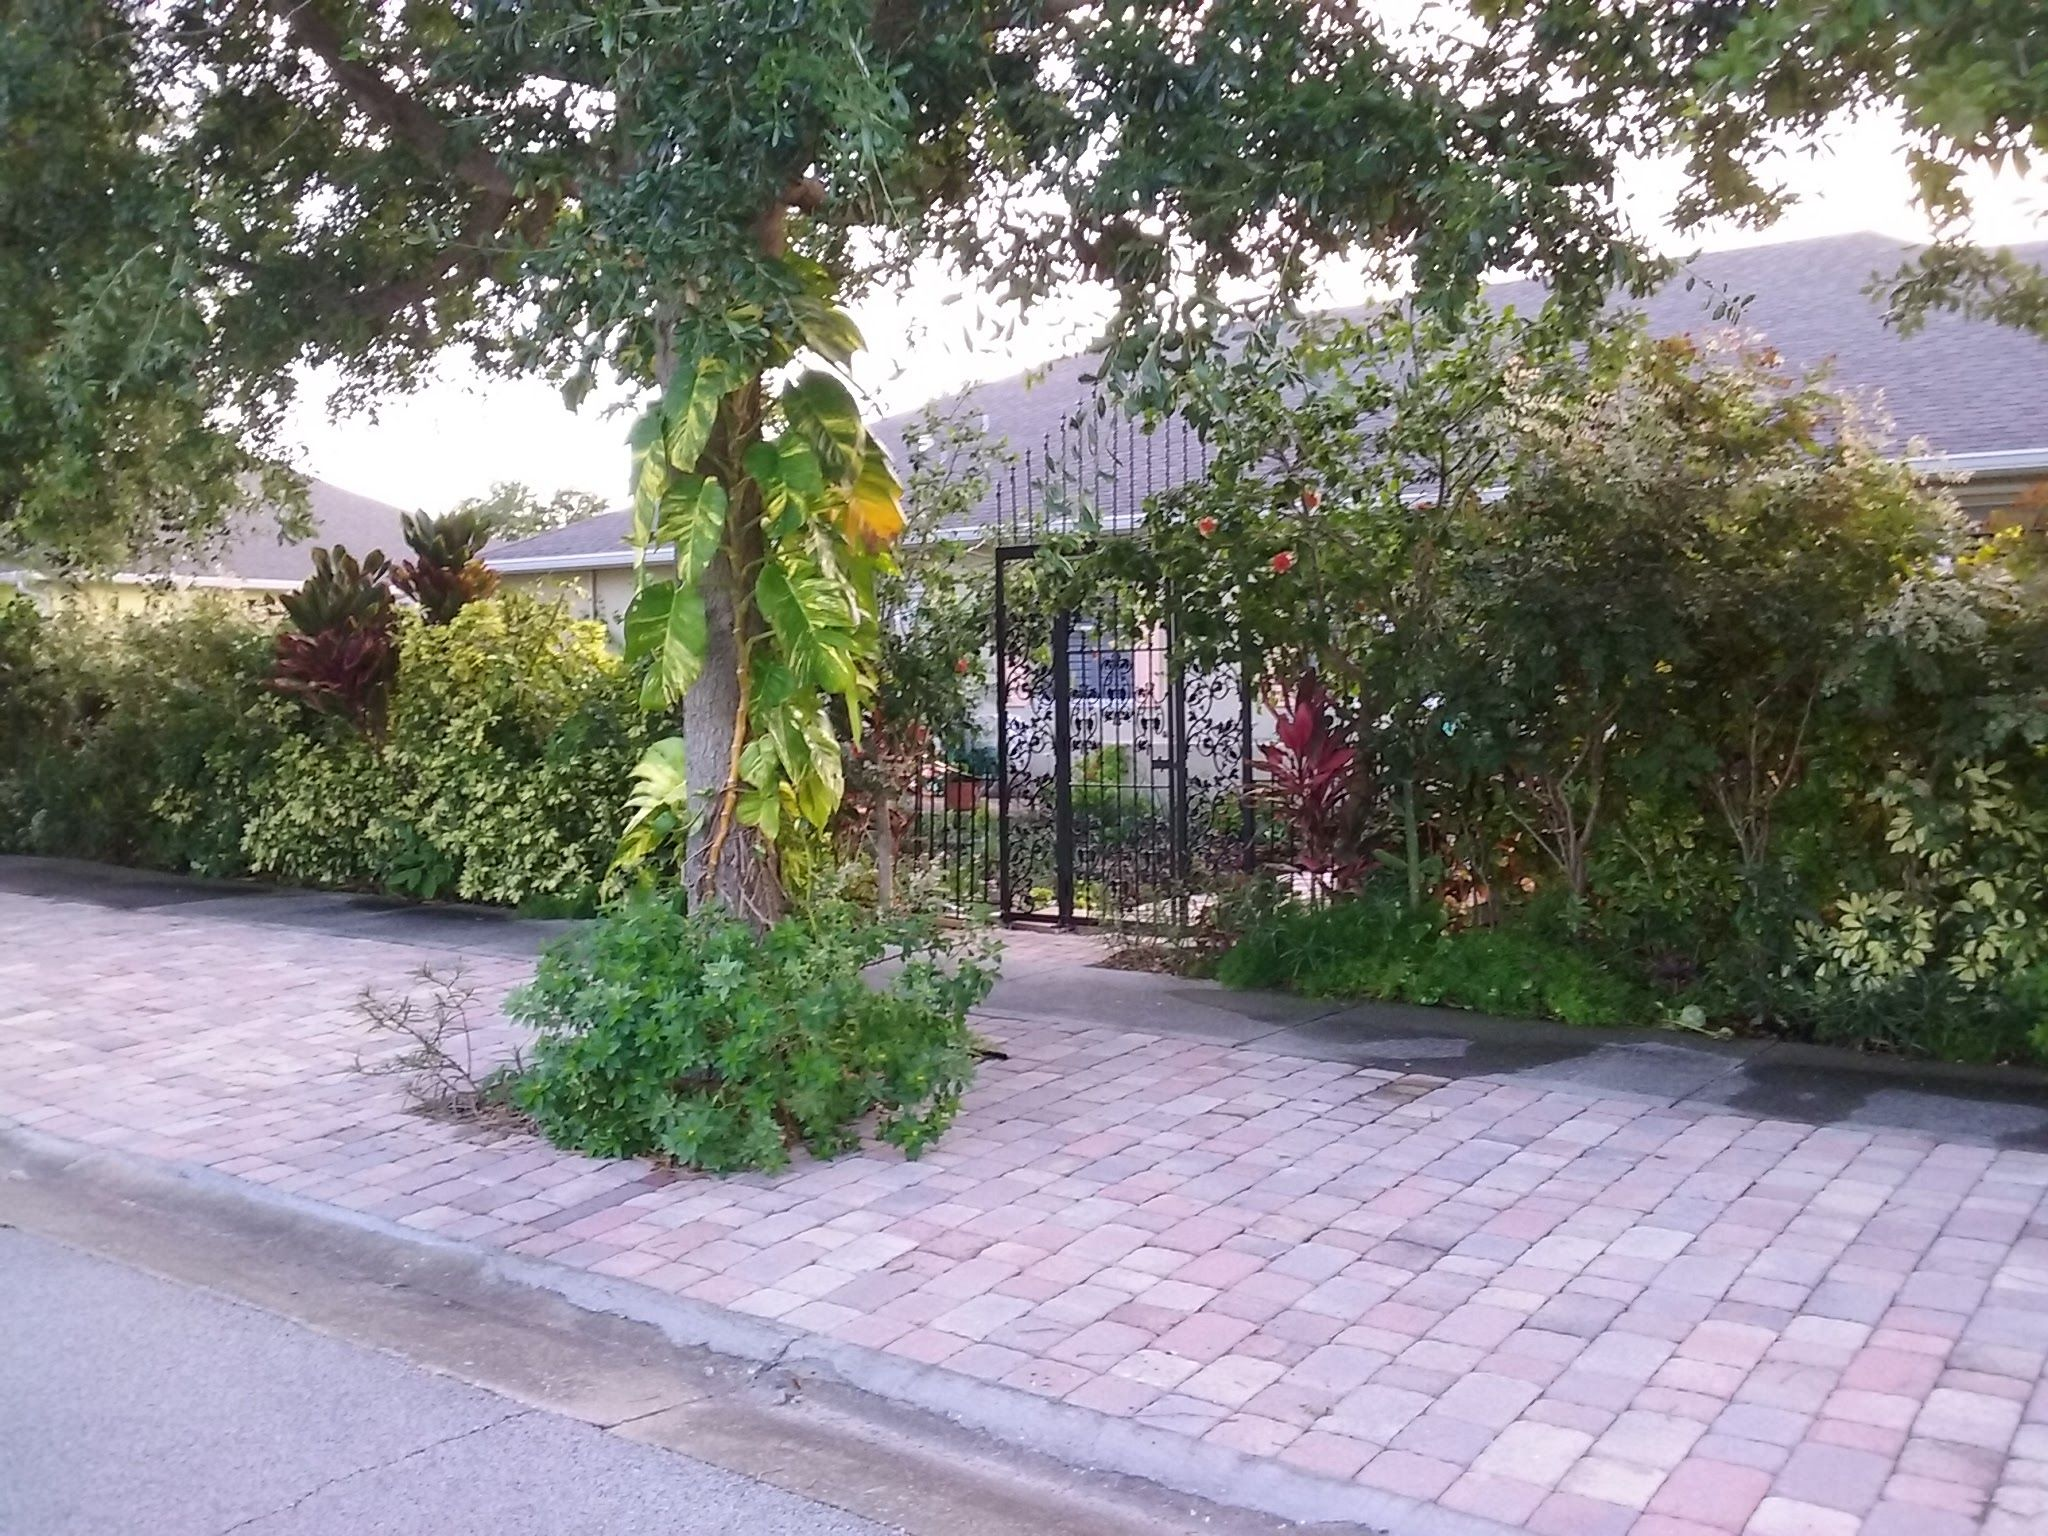 129 Madison Ave, Cape Canaveral, FL 32920 - Estimate and Home ...